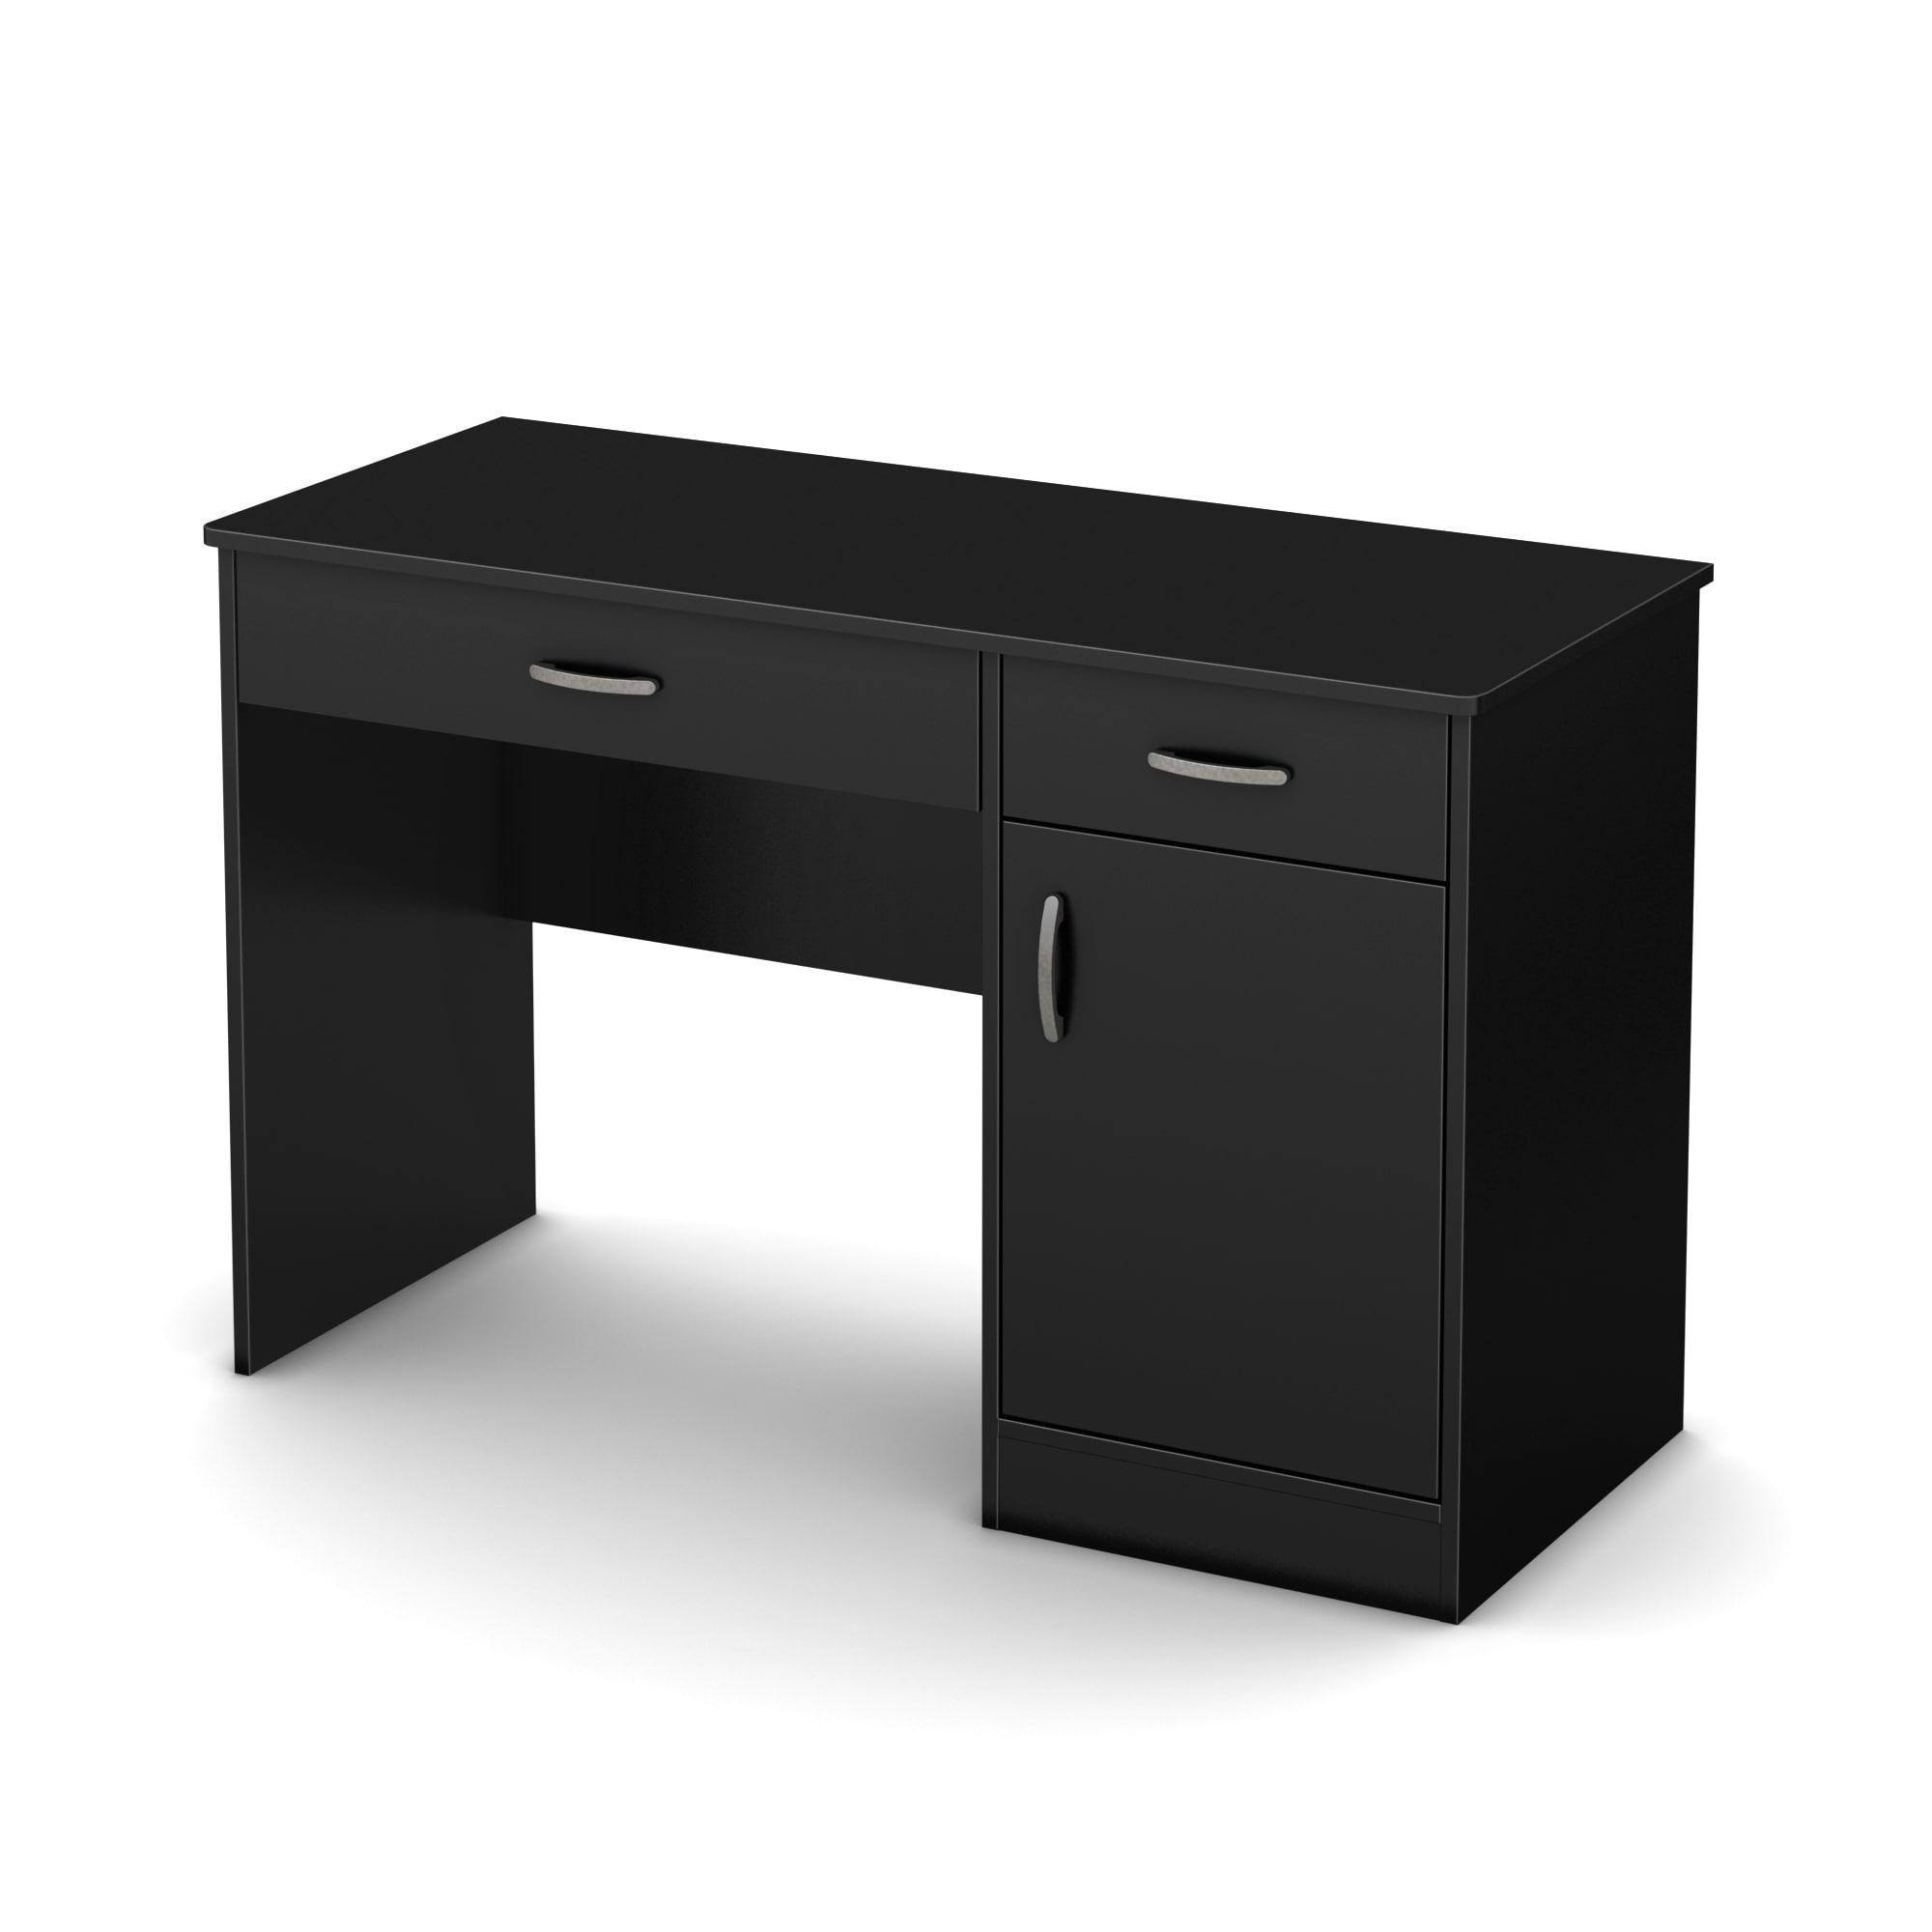 - Shop South Shore Axess Small Desk - Overstock - 10152316 - Pure White